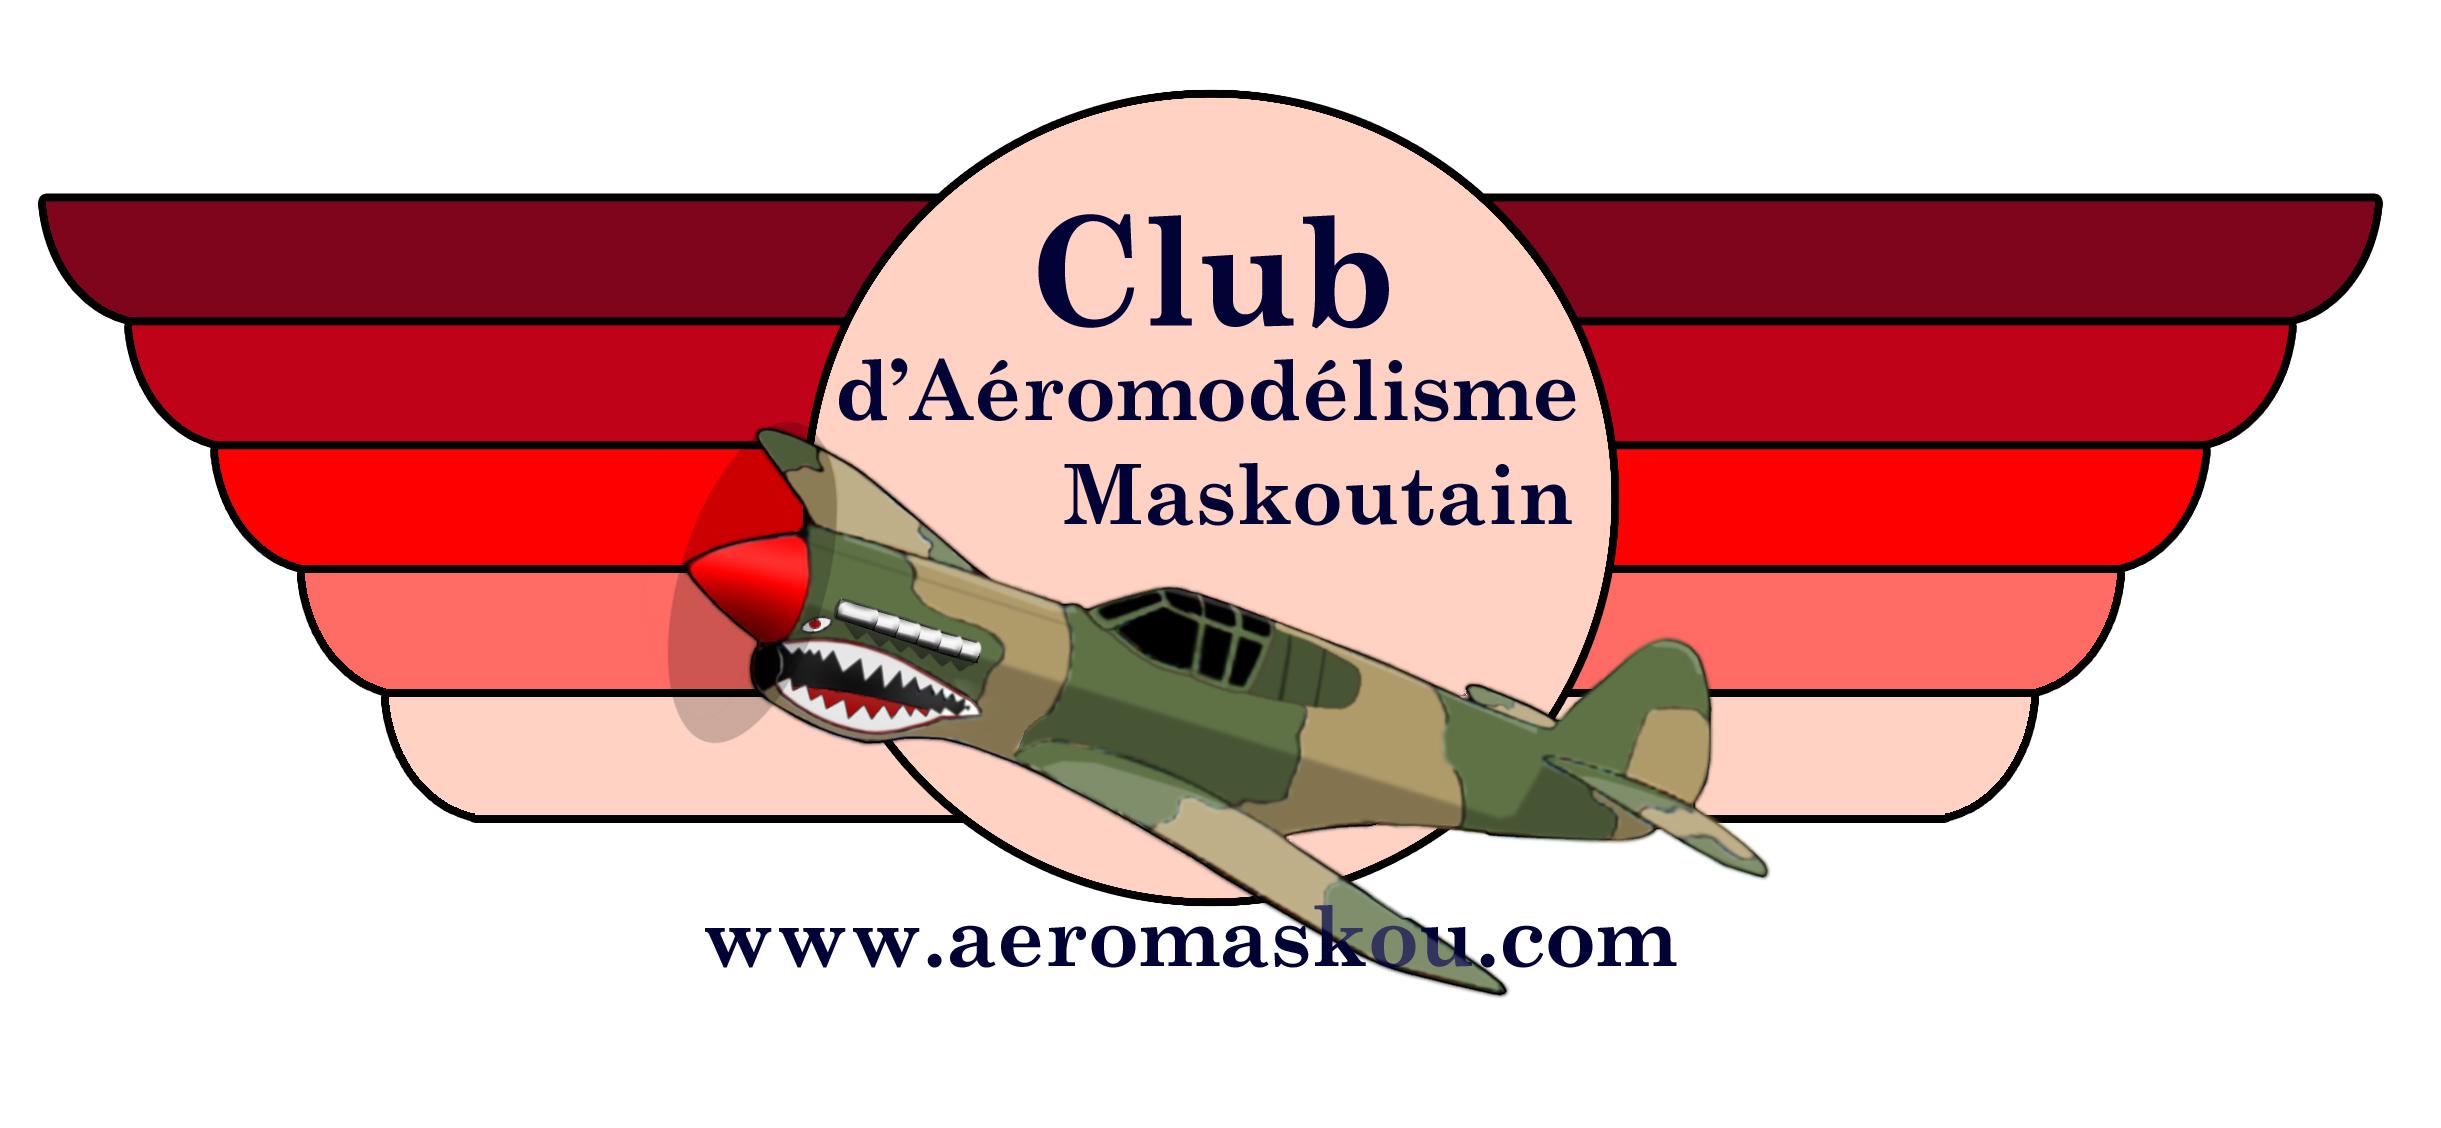 Club d'aéromodélisme Maskoutain